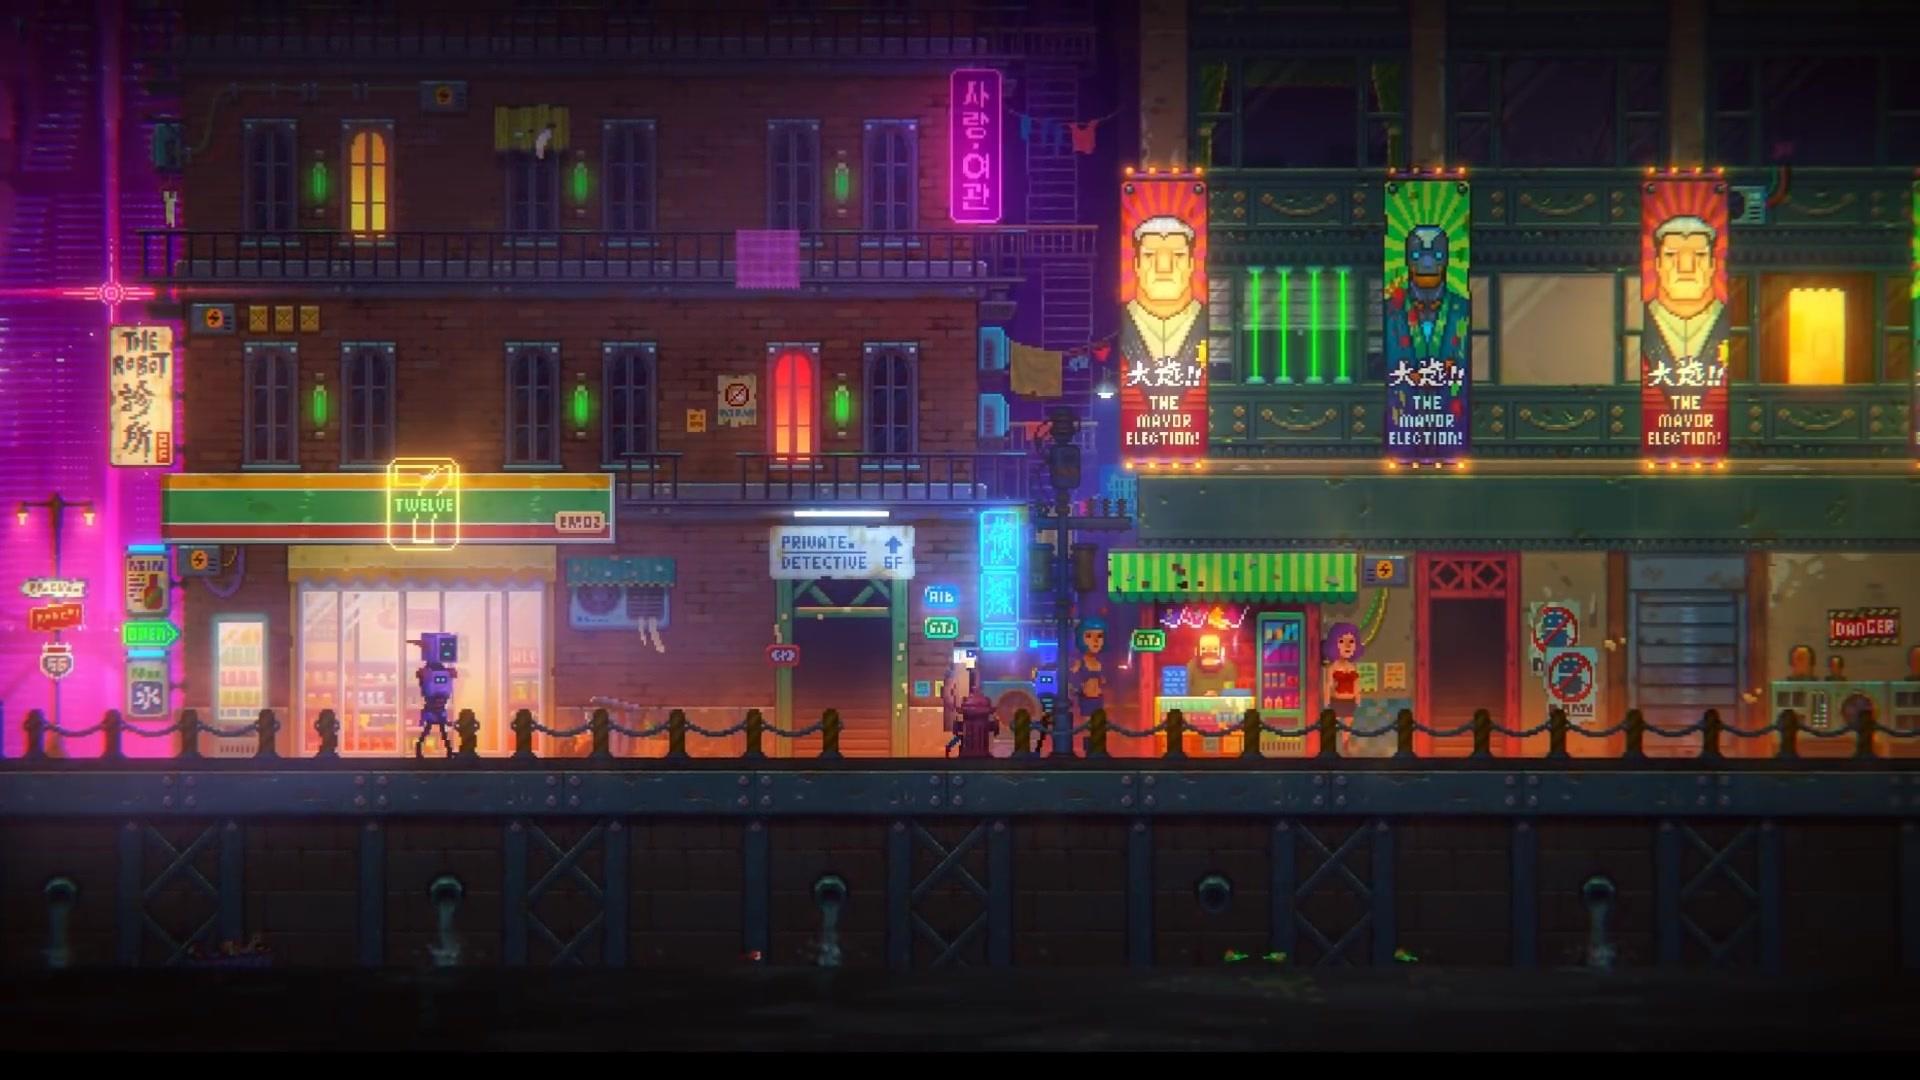 Tales of the Neon Sea - Trailer zum humorvollen Cyberpunk-Adventure